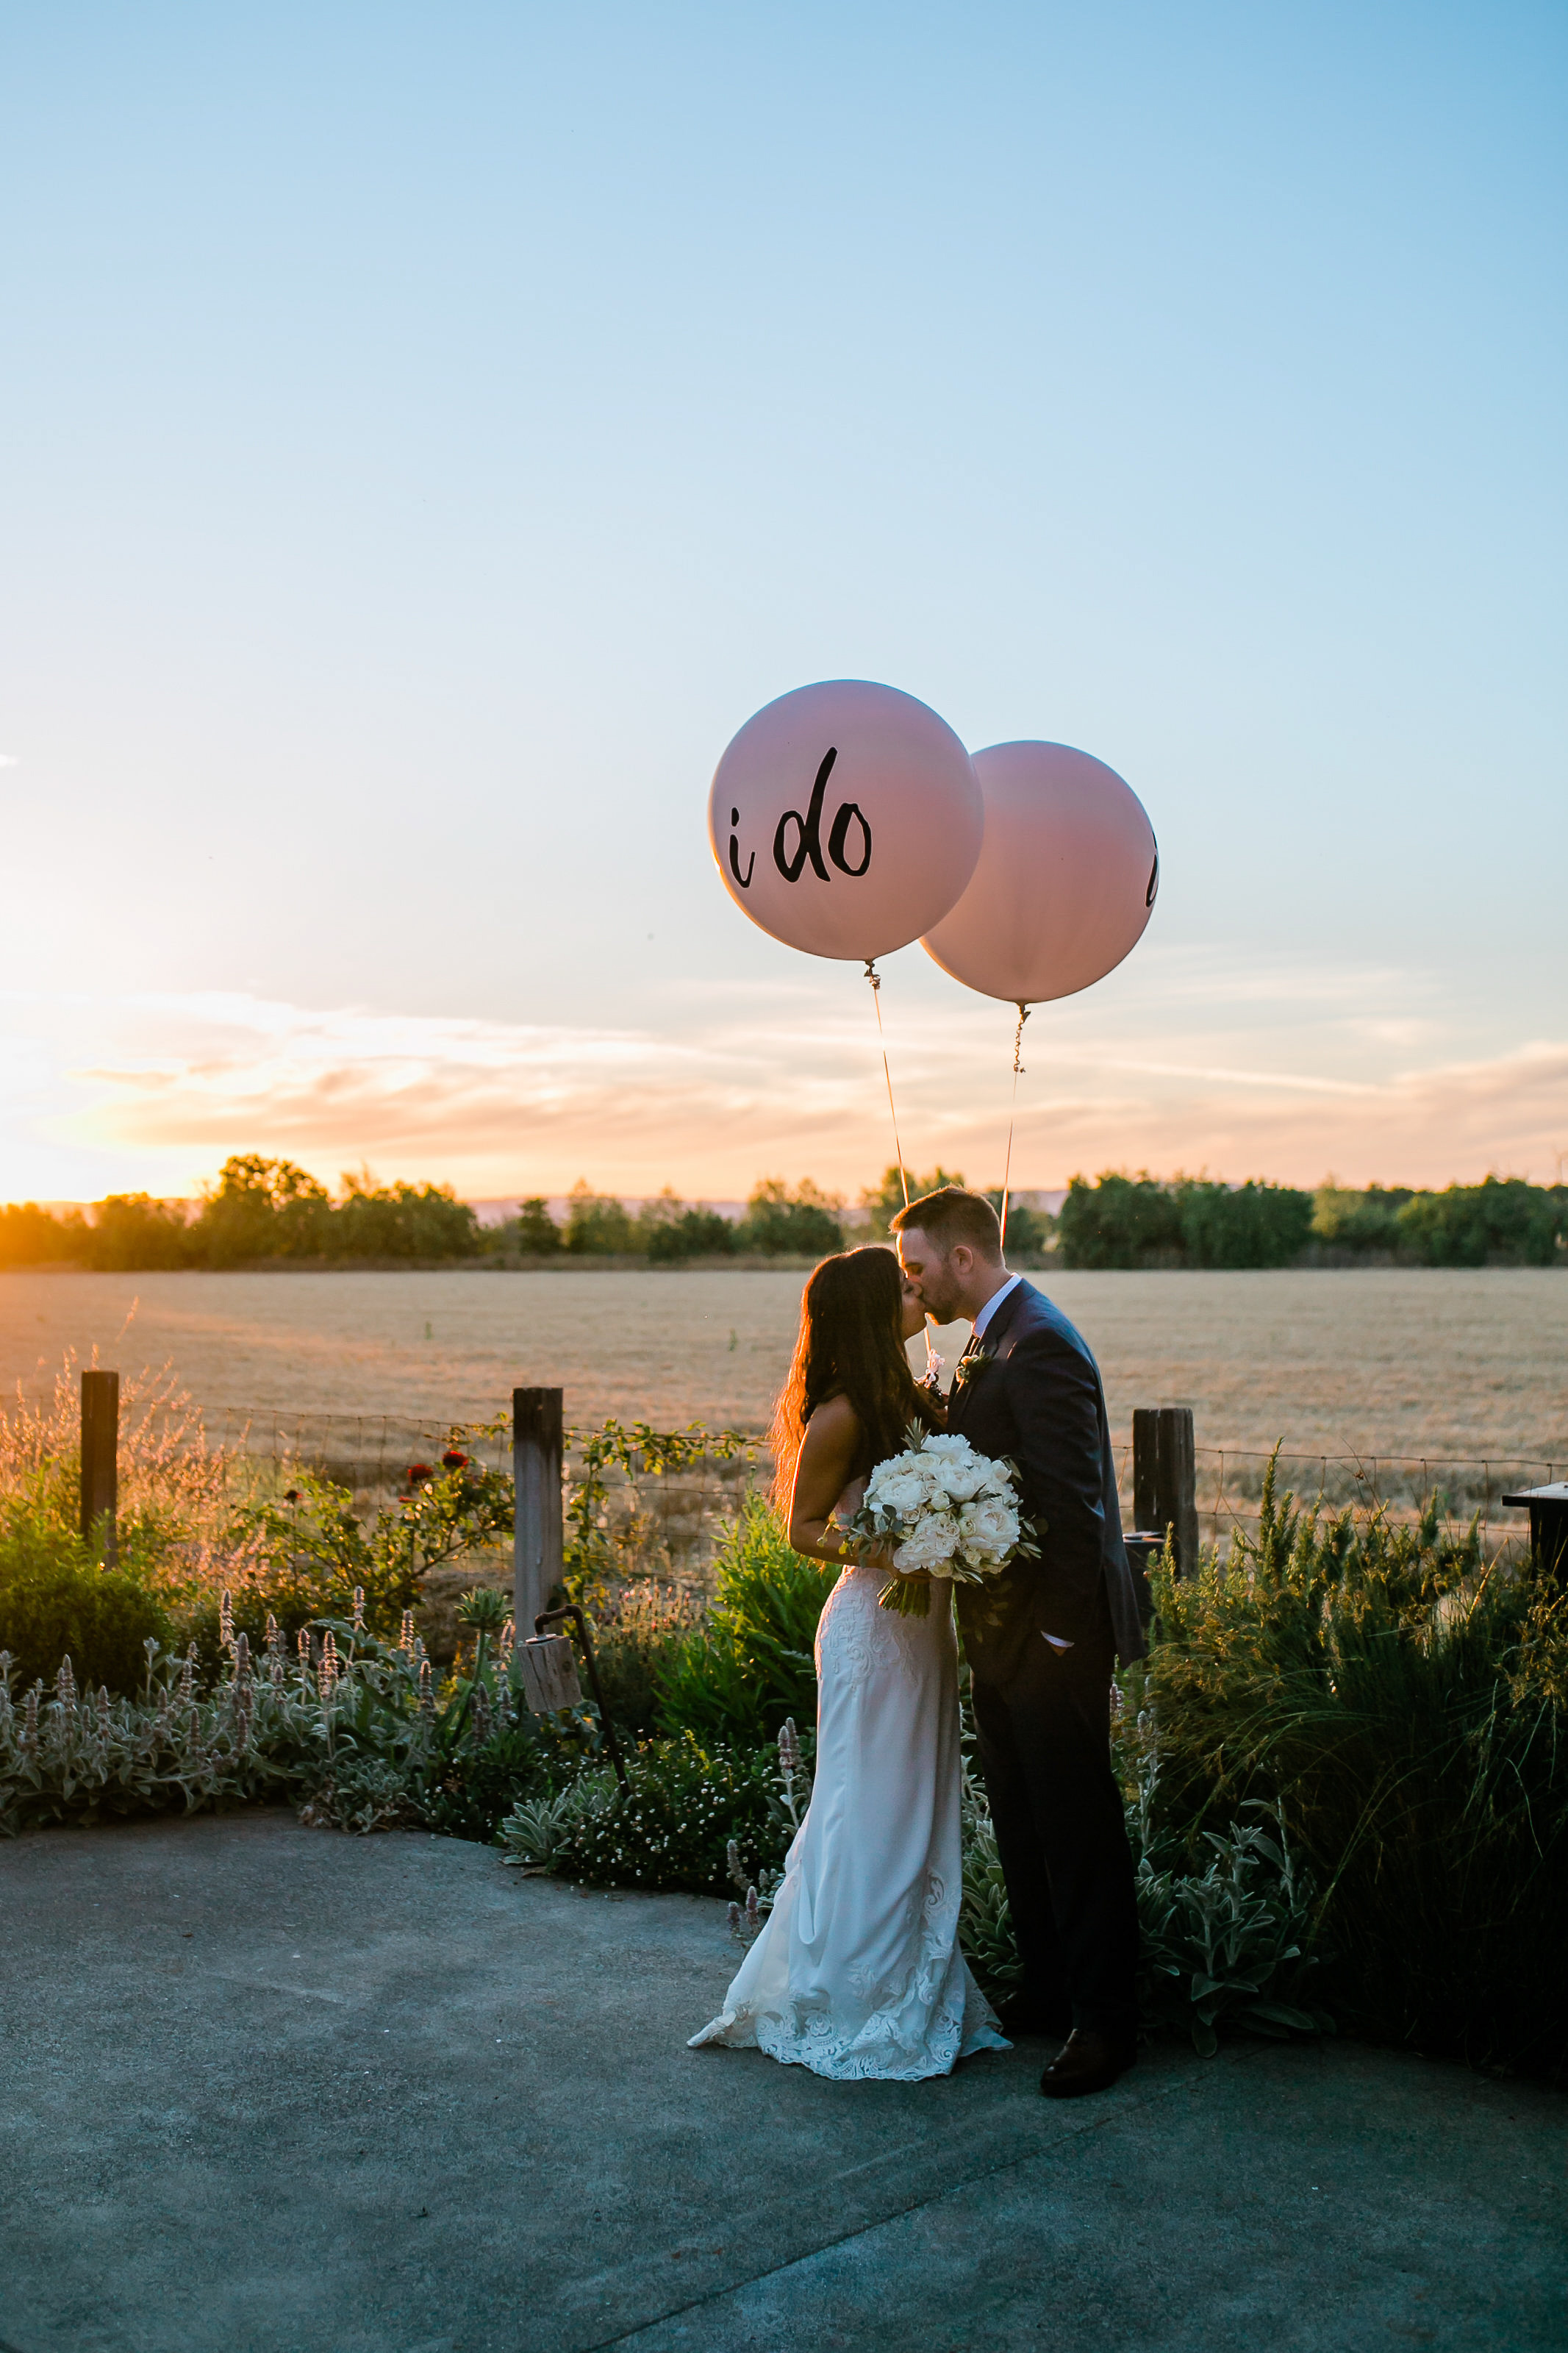 Park Winters Summer Wedding | Country Wedding | Farm Wedding | Bride and Groom Portrait | I Do balloons